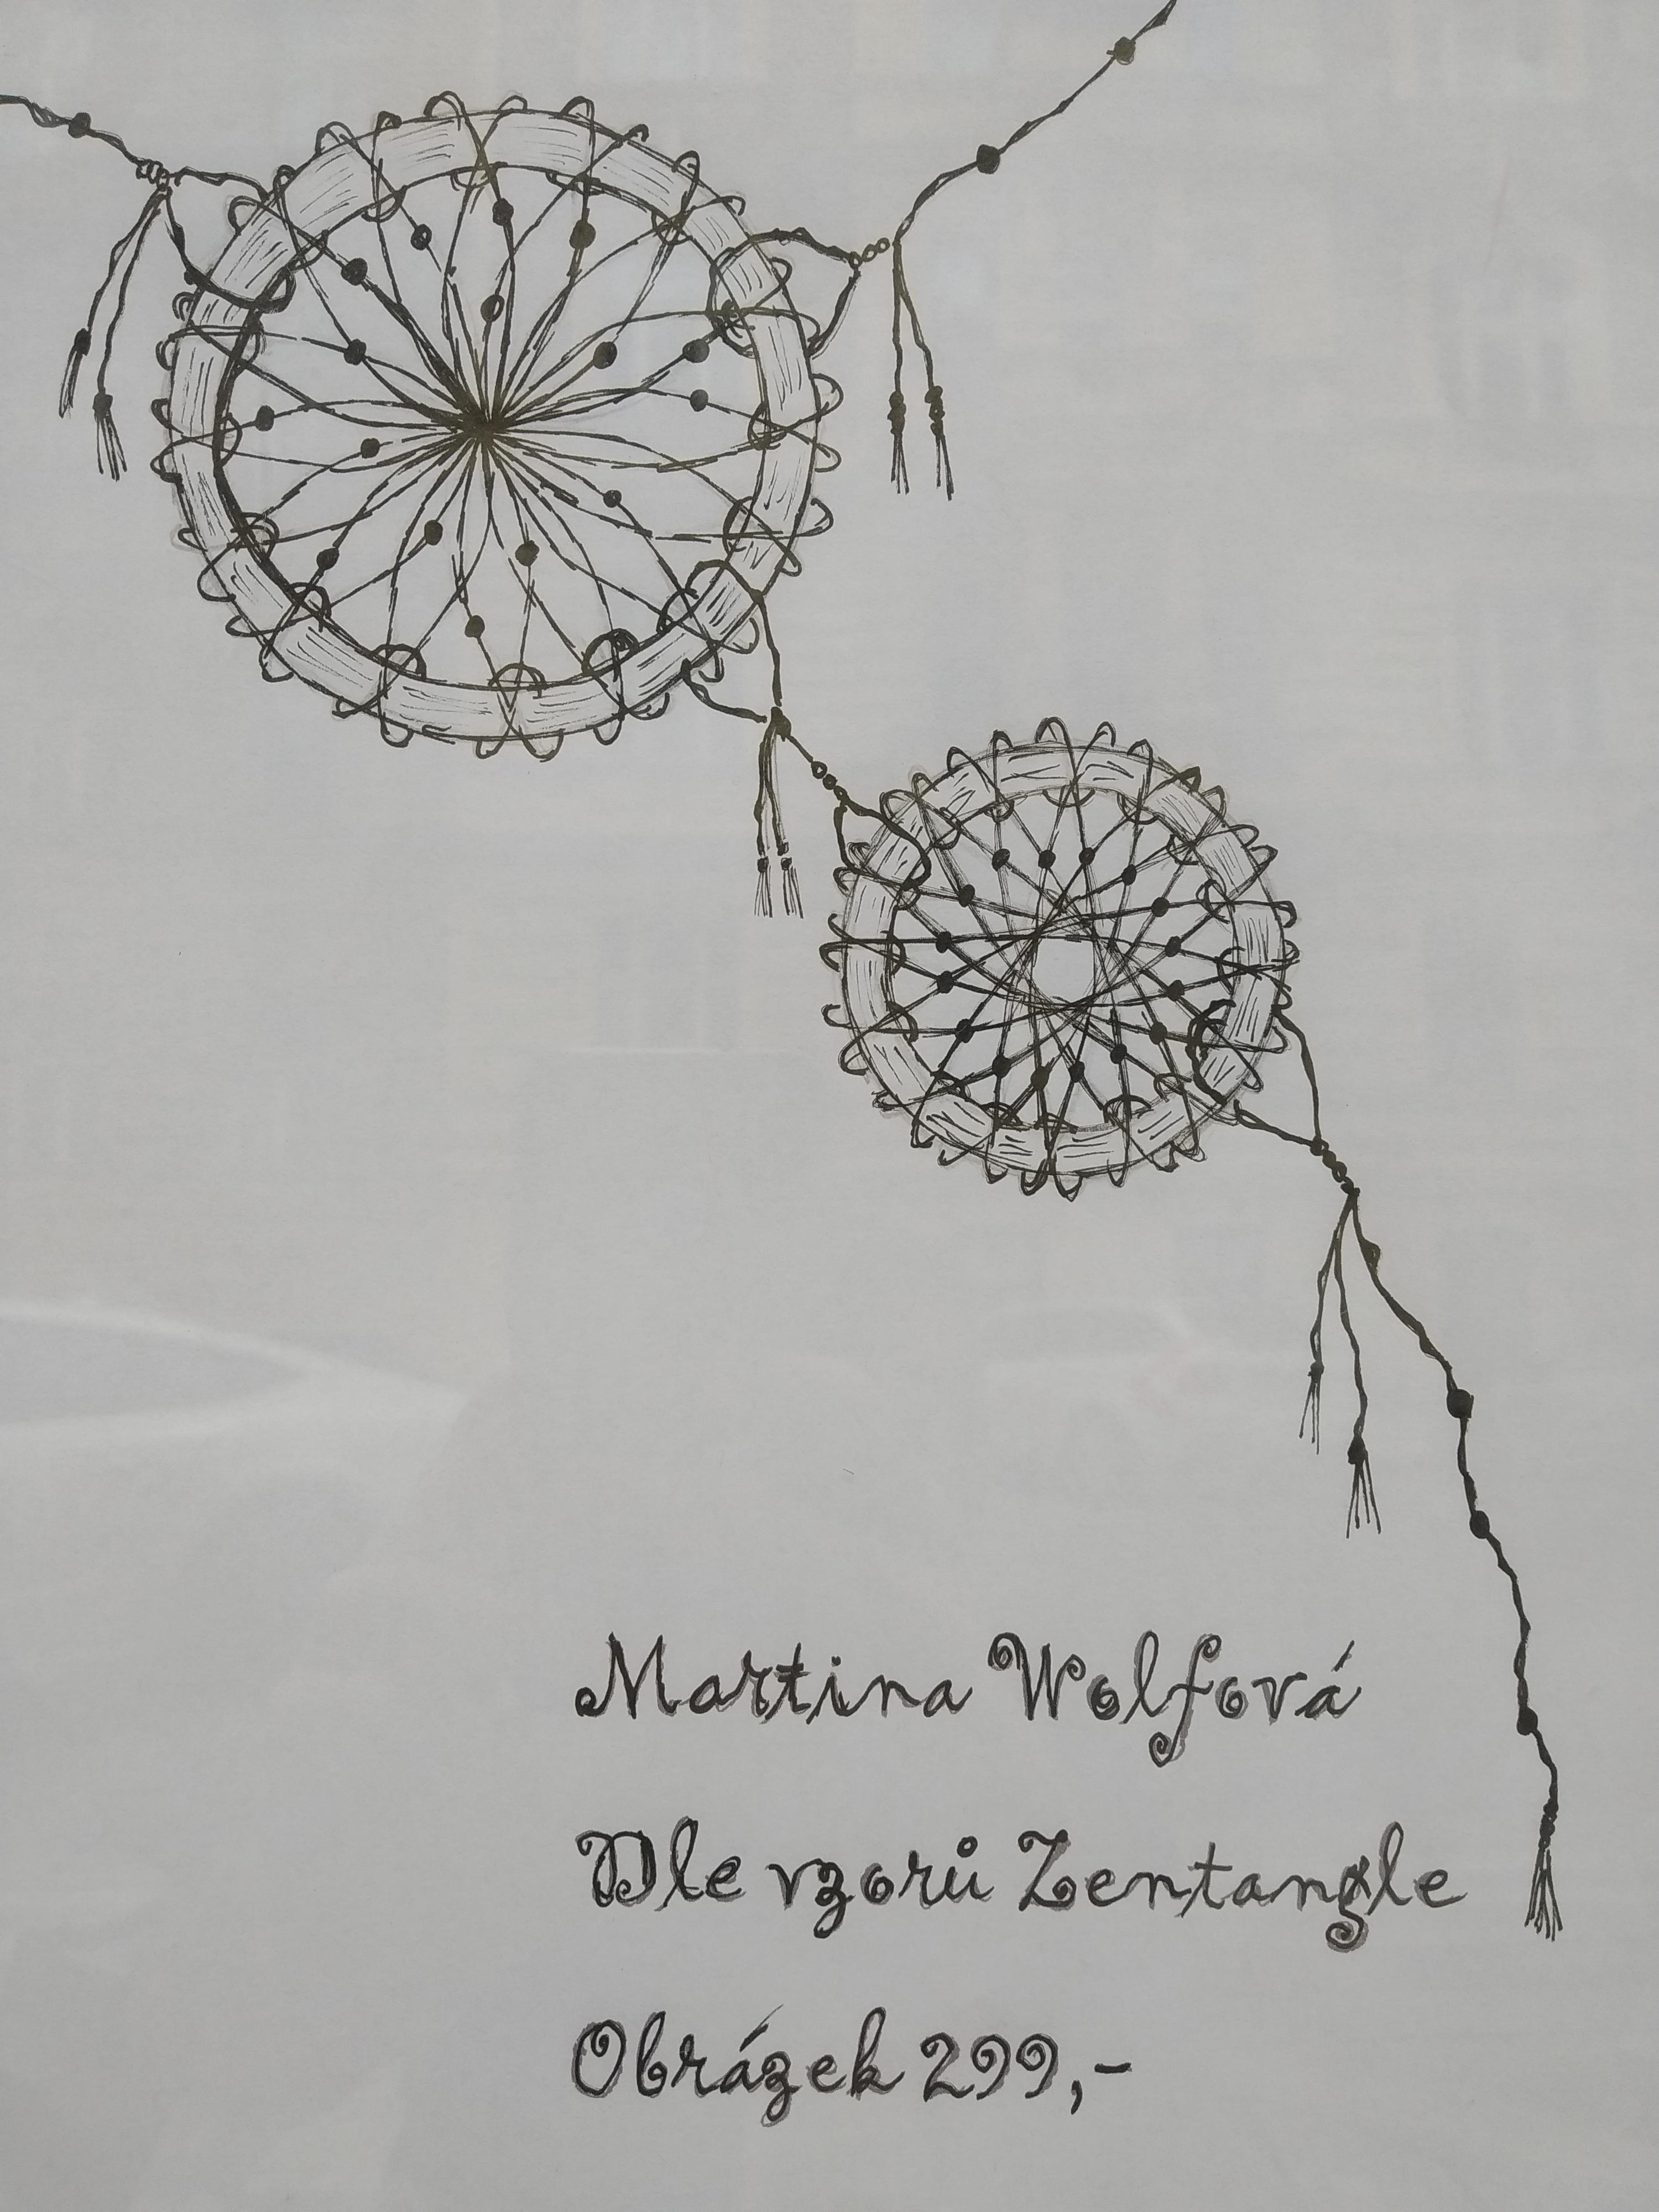 Martina Wolfová's Exhibition